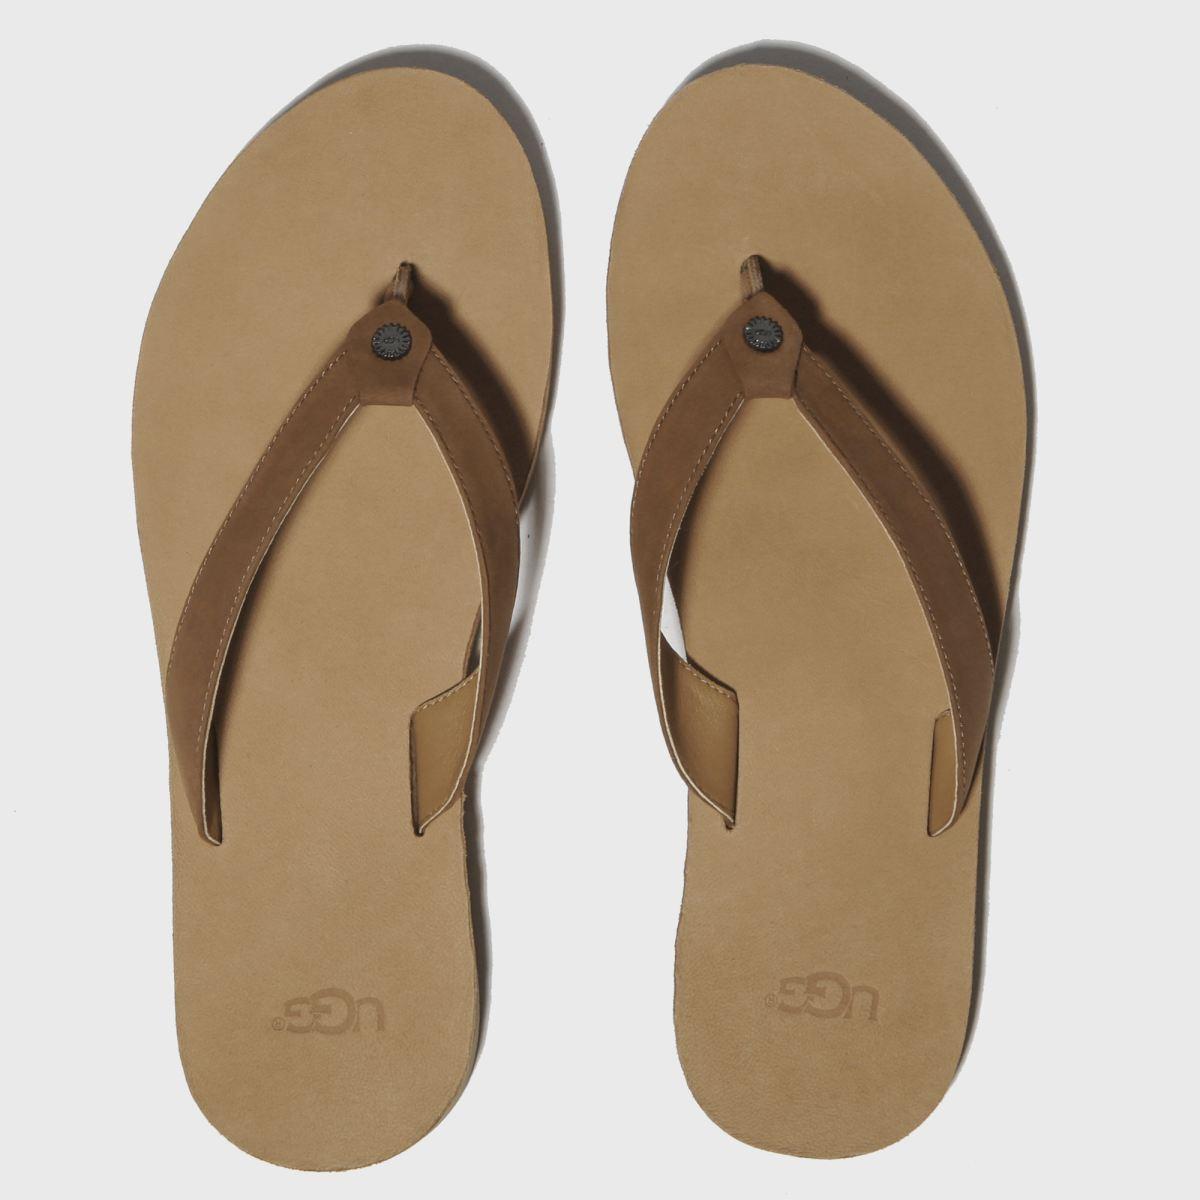 Ugg Tan Tawney Sandals